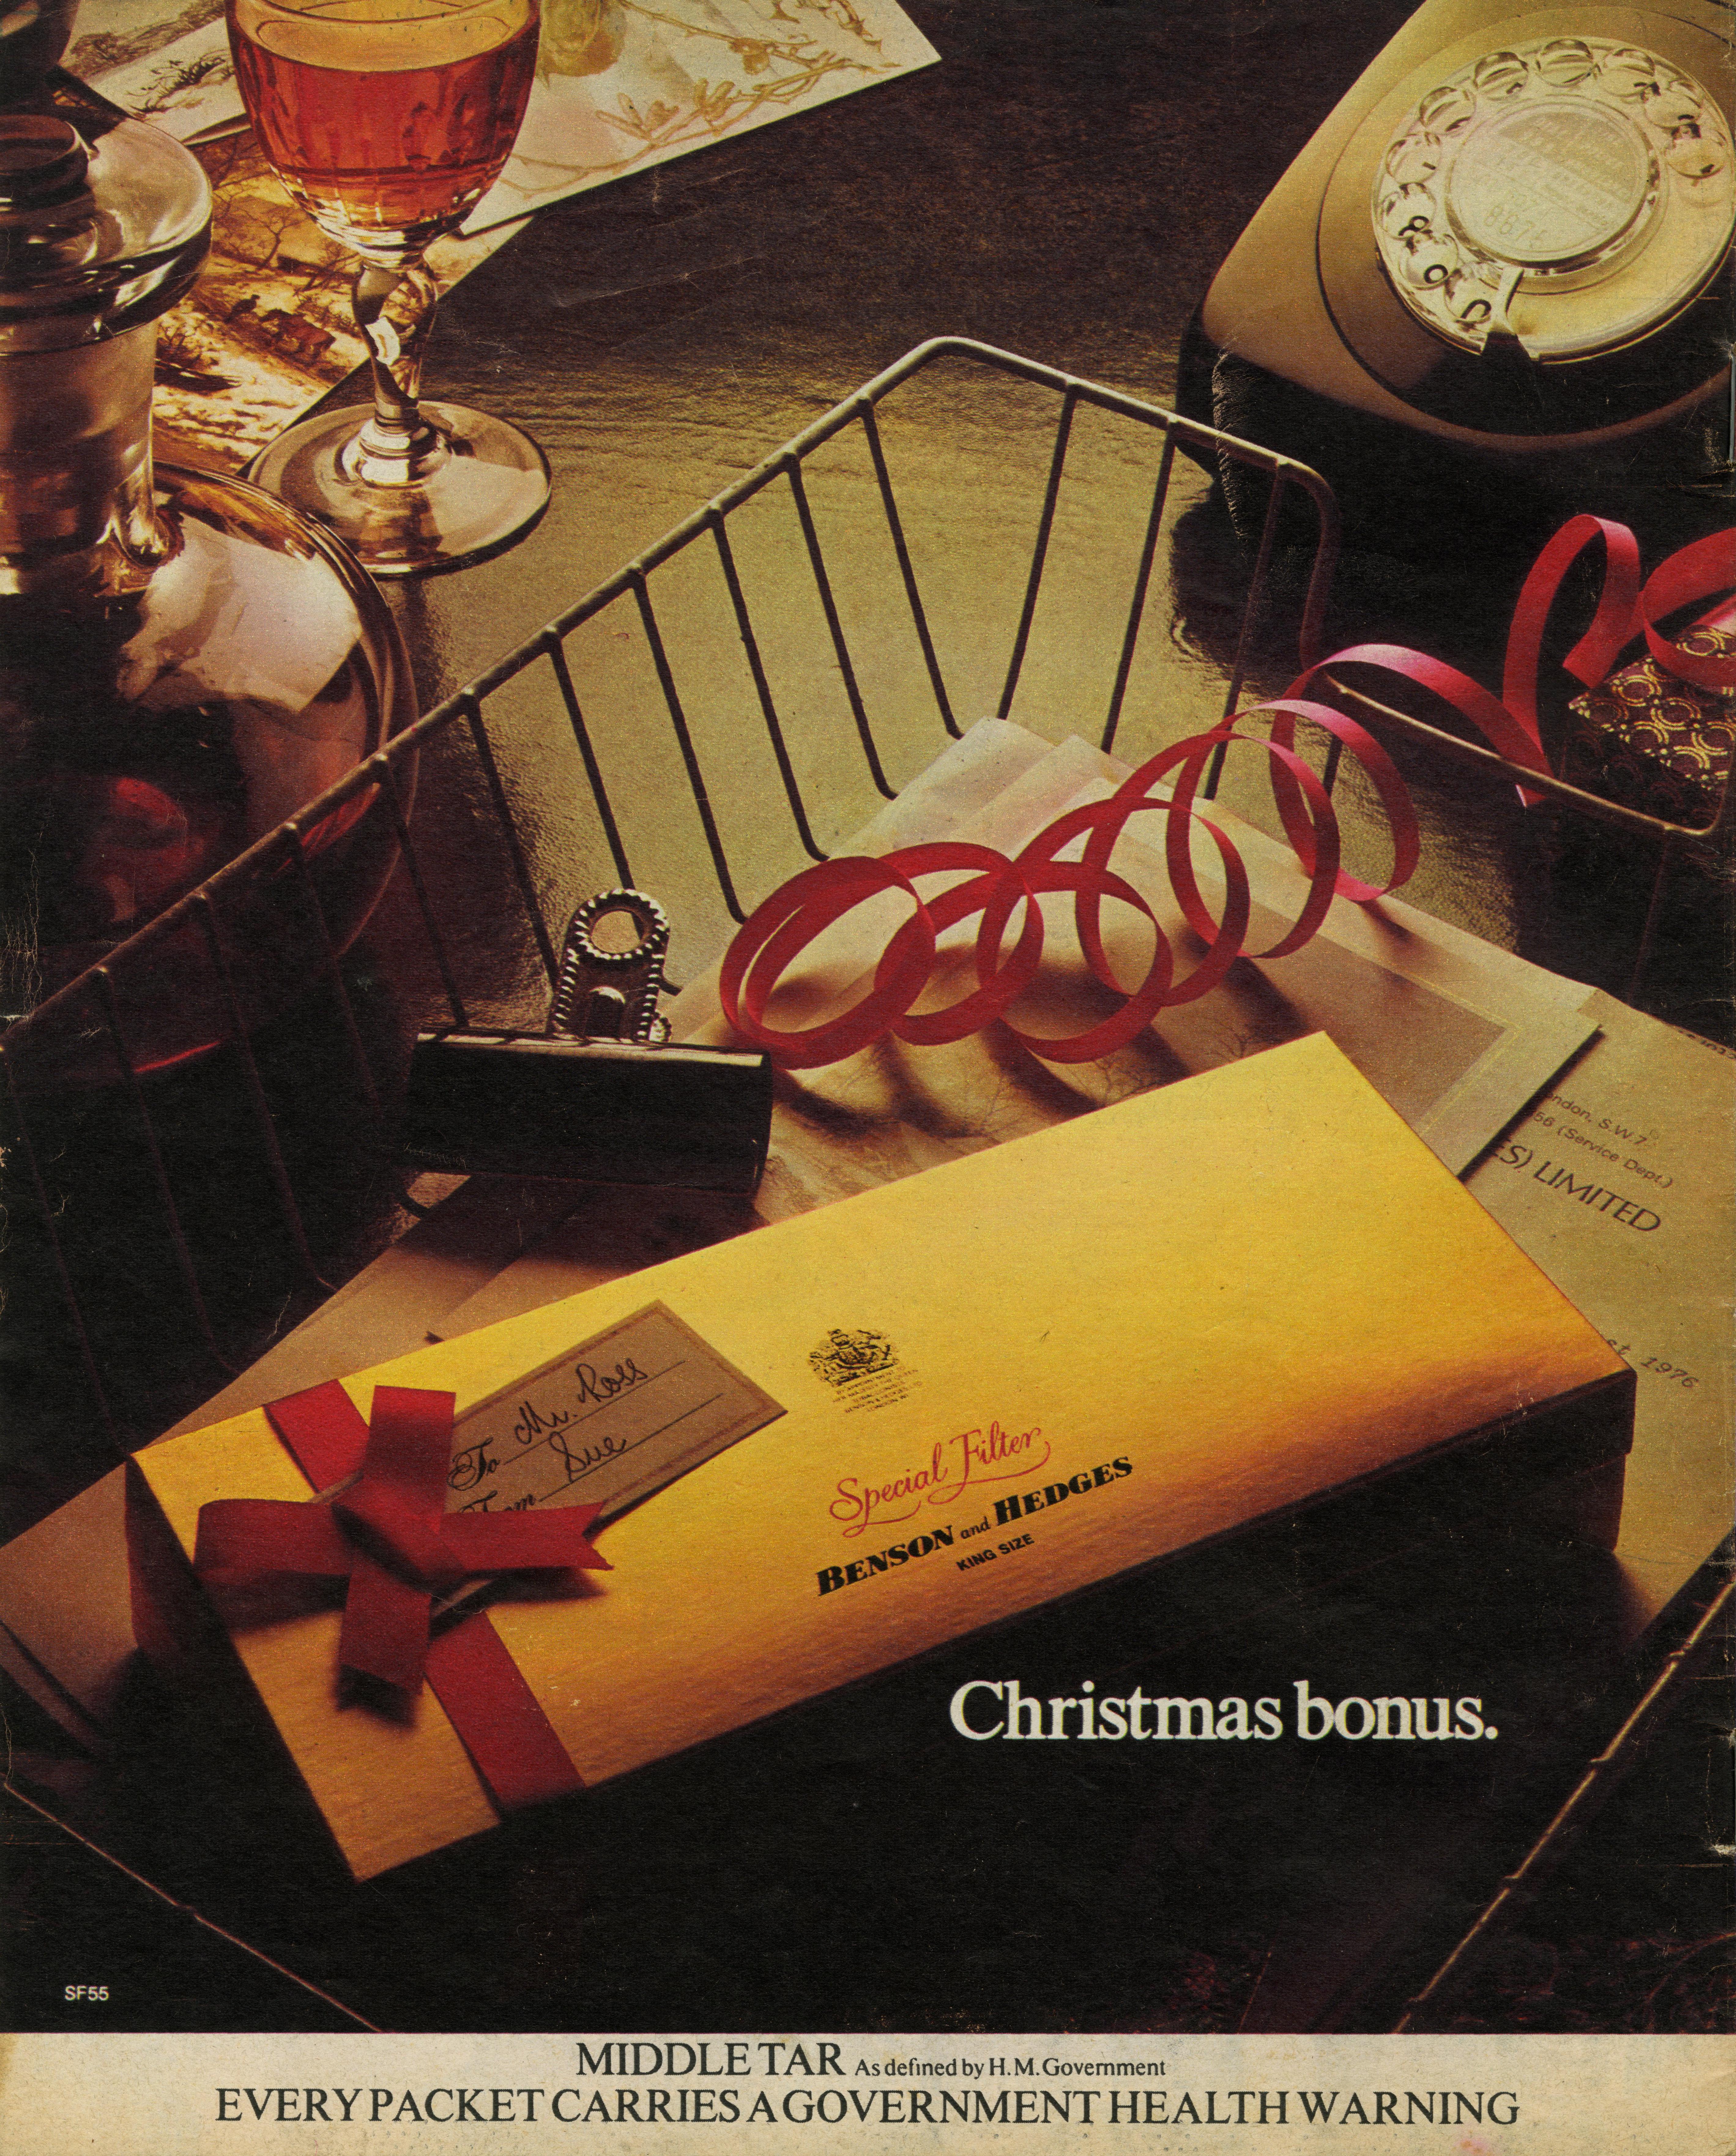 B&H Gold Box - 'Christmas Bonus', CDP-01